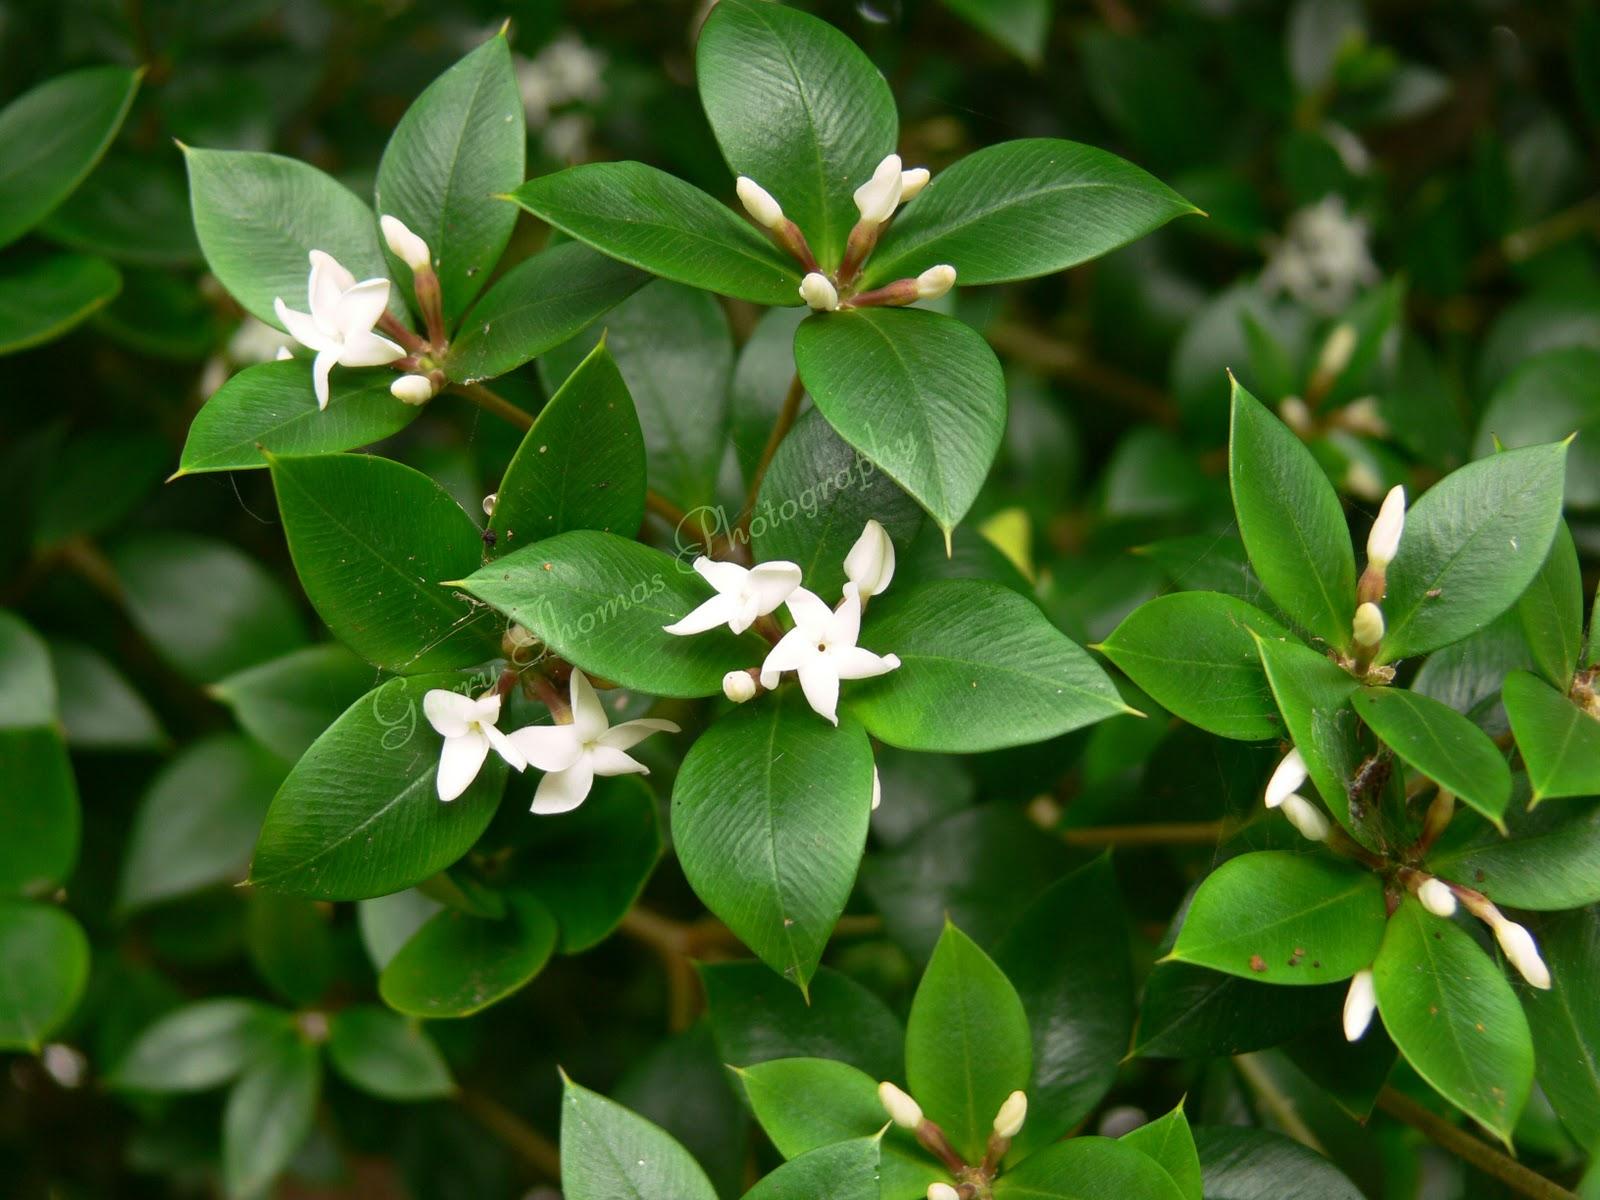 Oleander Poisonous To Dogs Australia